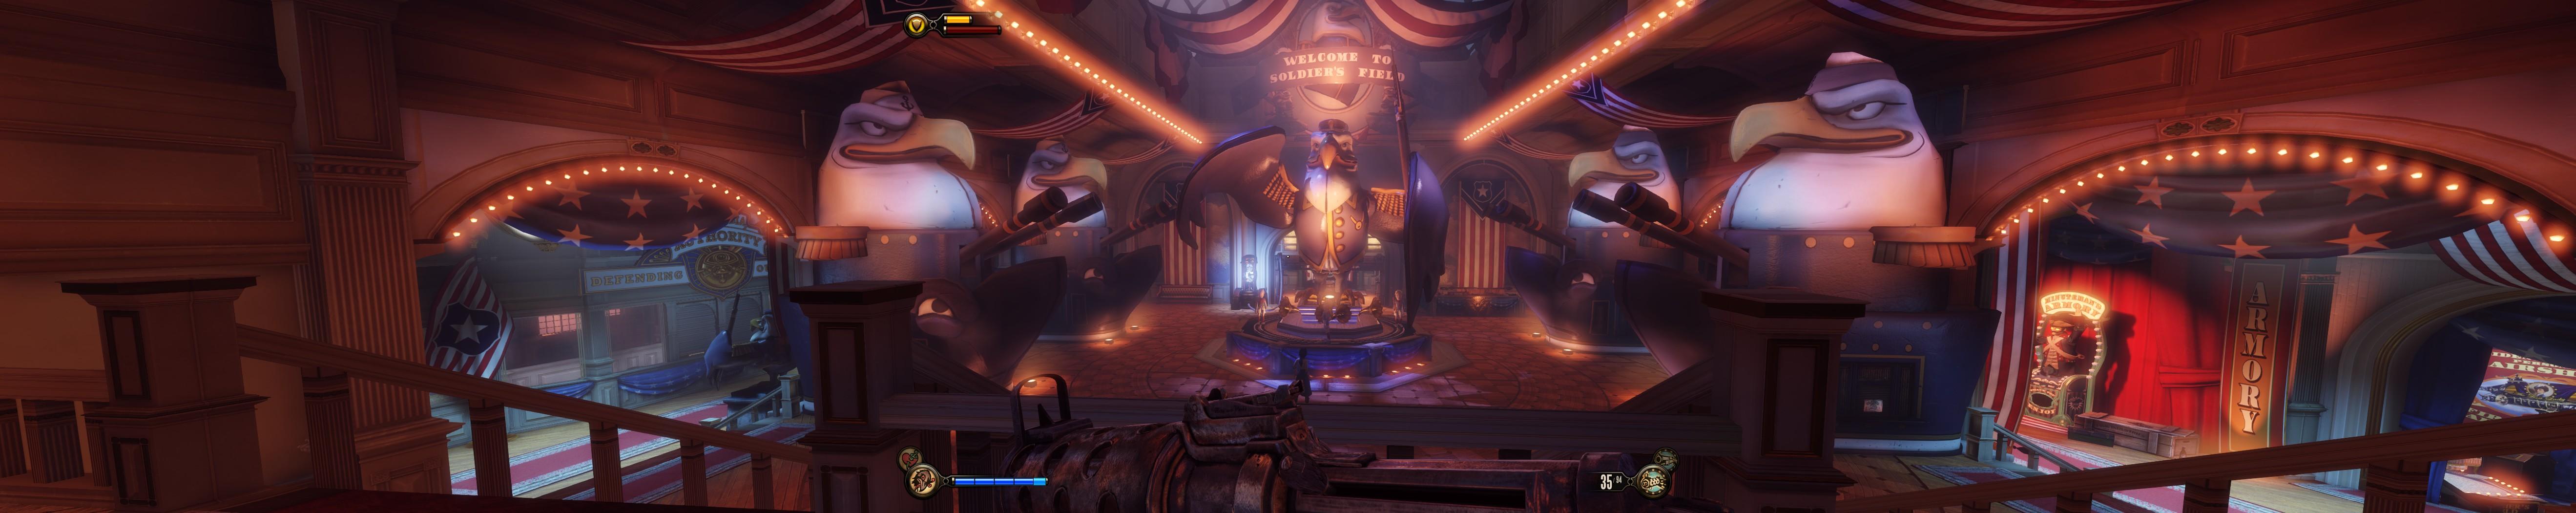 Bioshock_Infinite_2013-04-21_00035.jpg